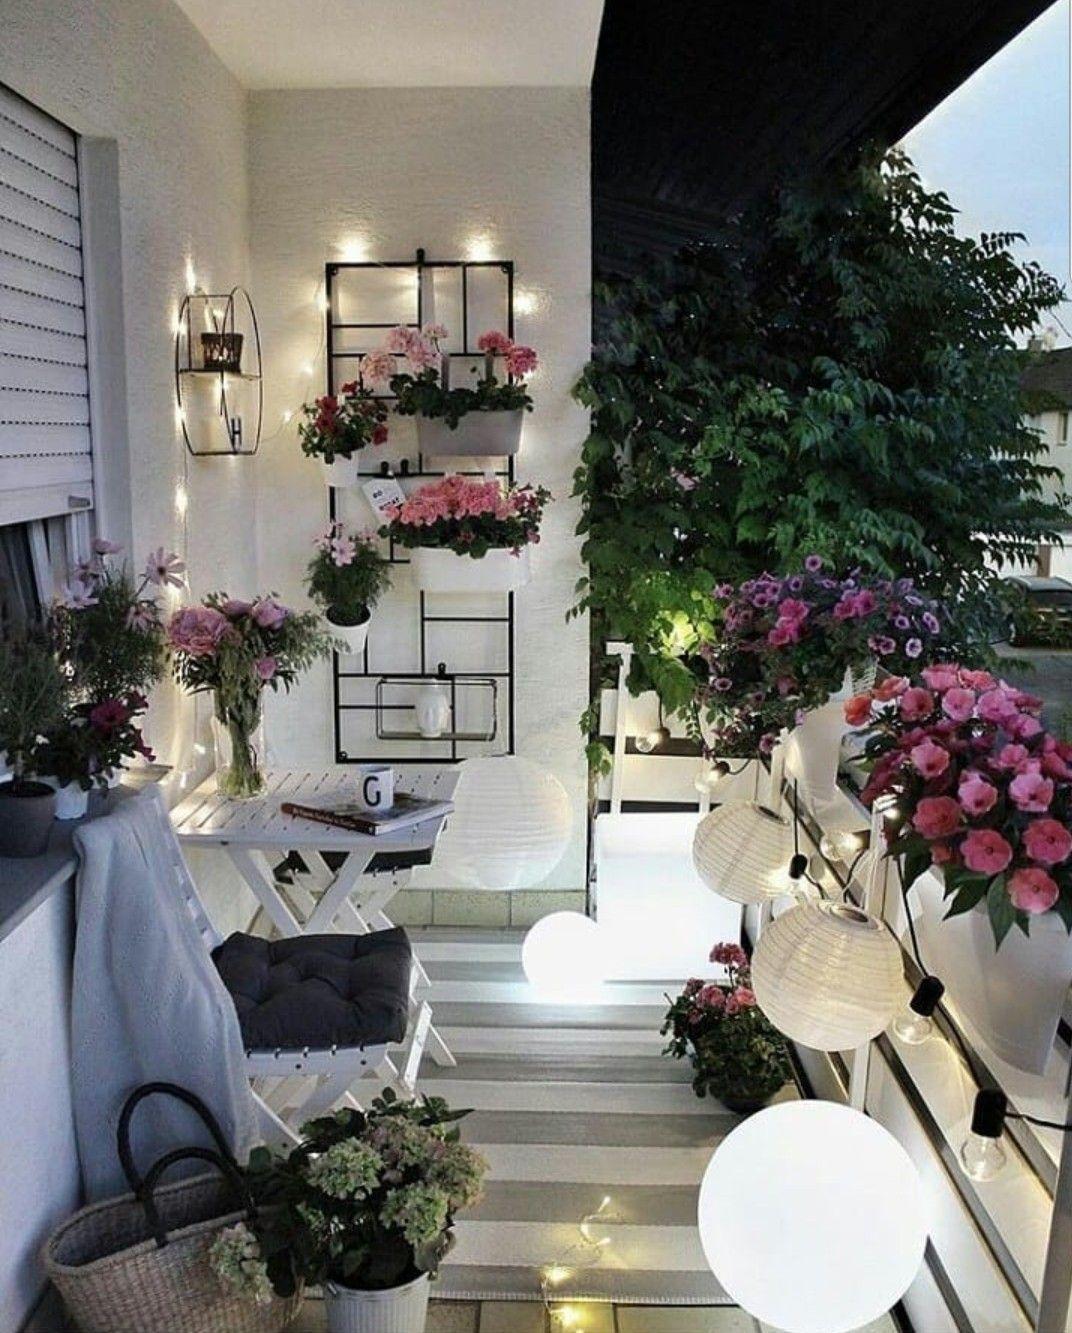 Pretty little porch wood cafe white wood flowers decoration terrace garden garden